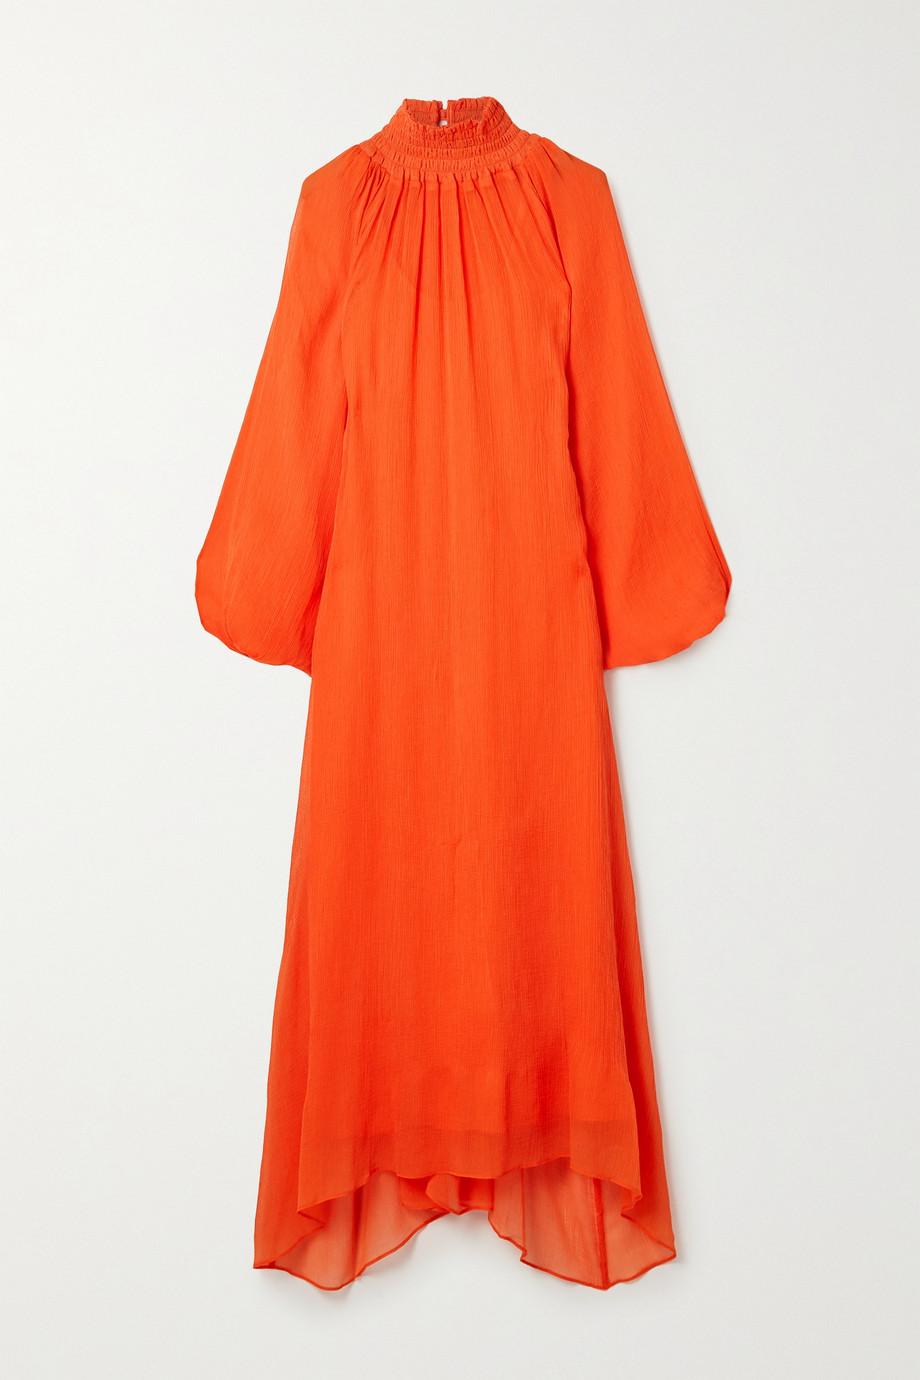 Mara Hoffman + NET SUSTAIN Edmonia asymmetric cotton-blend crepon dress